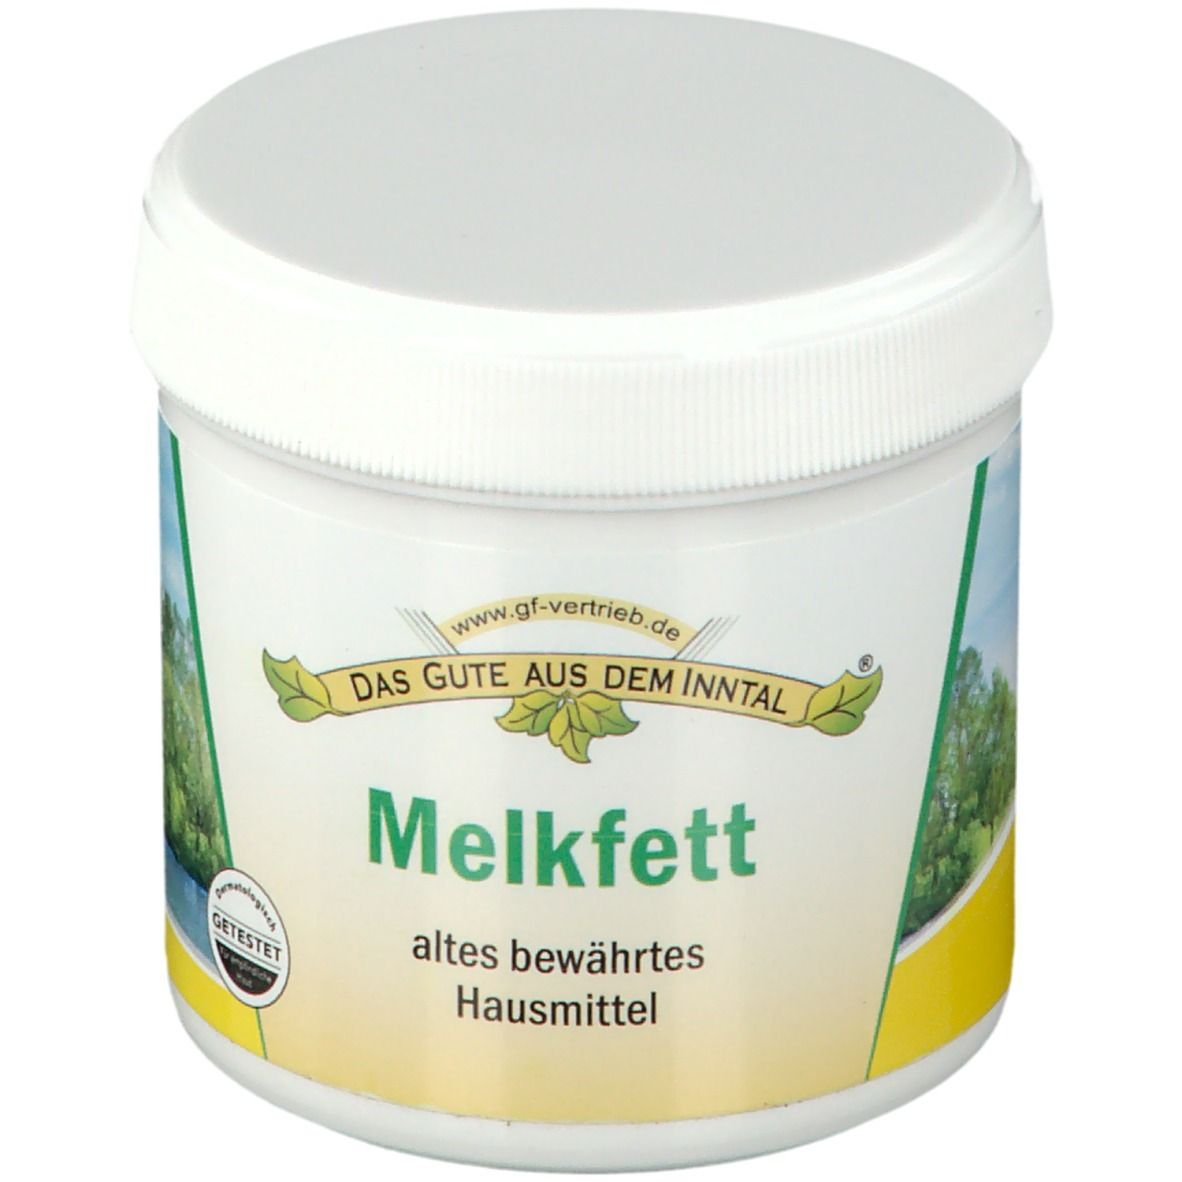 Image of Melkfett